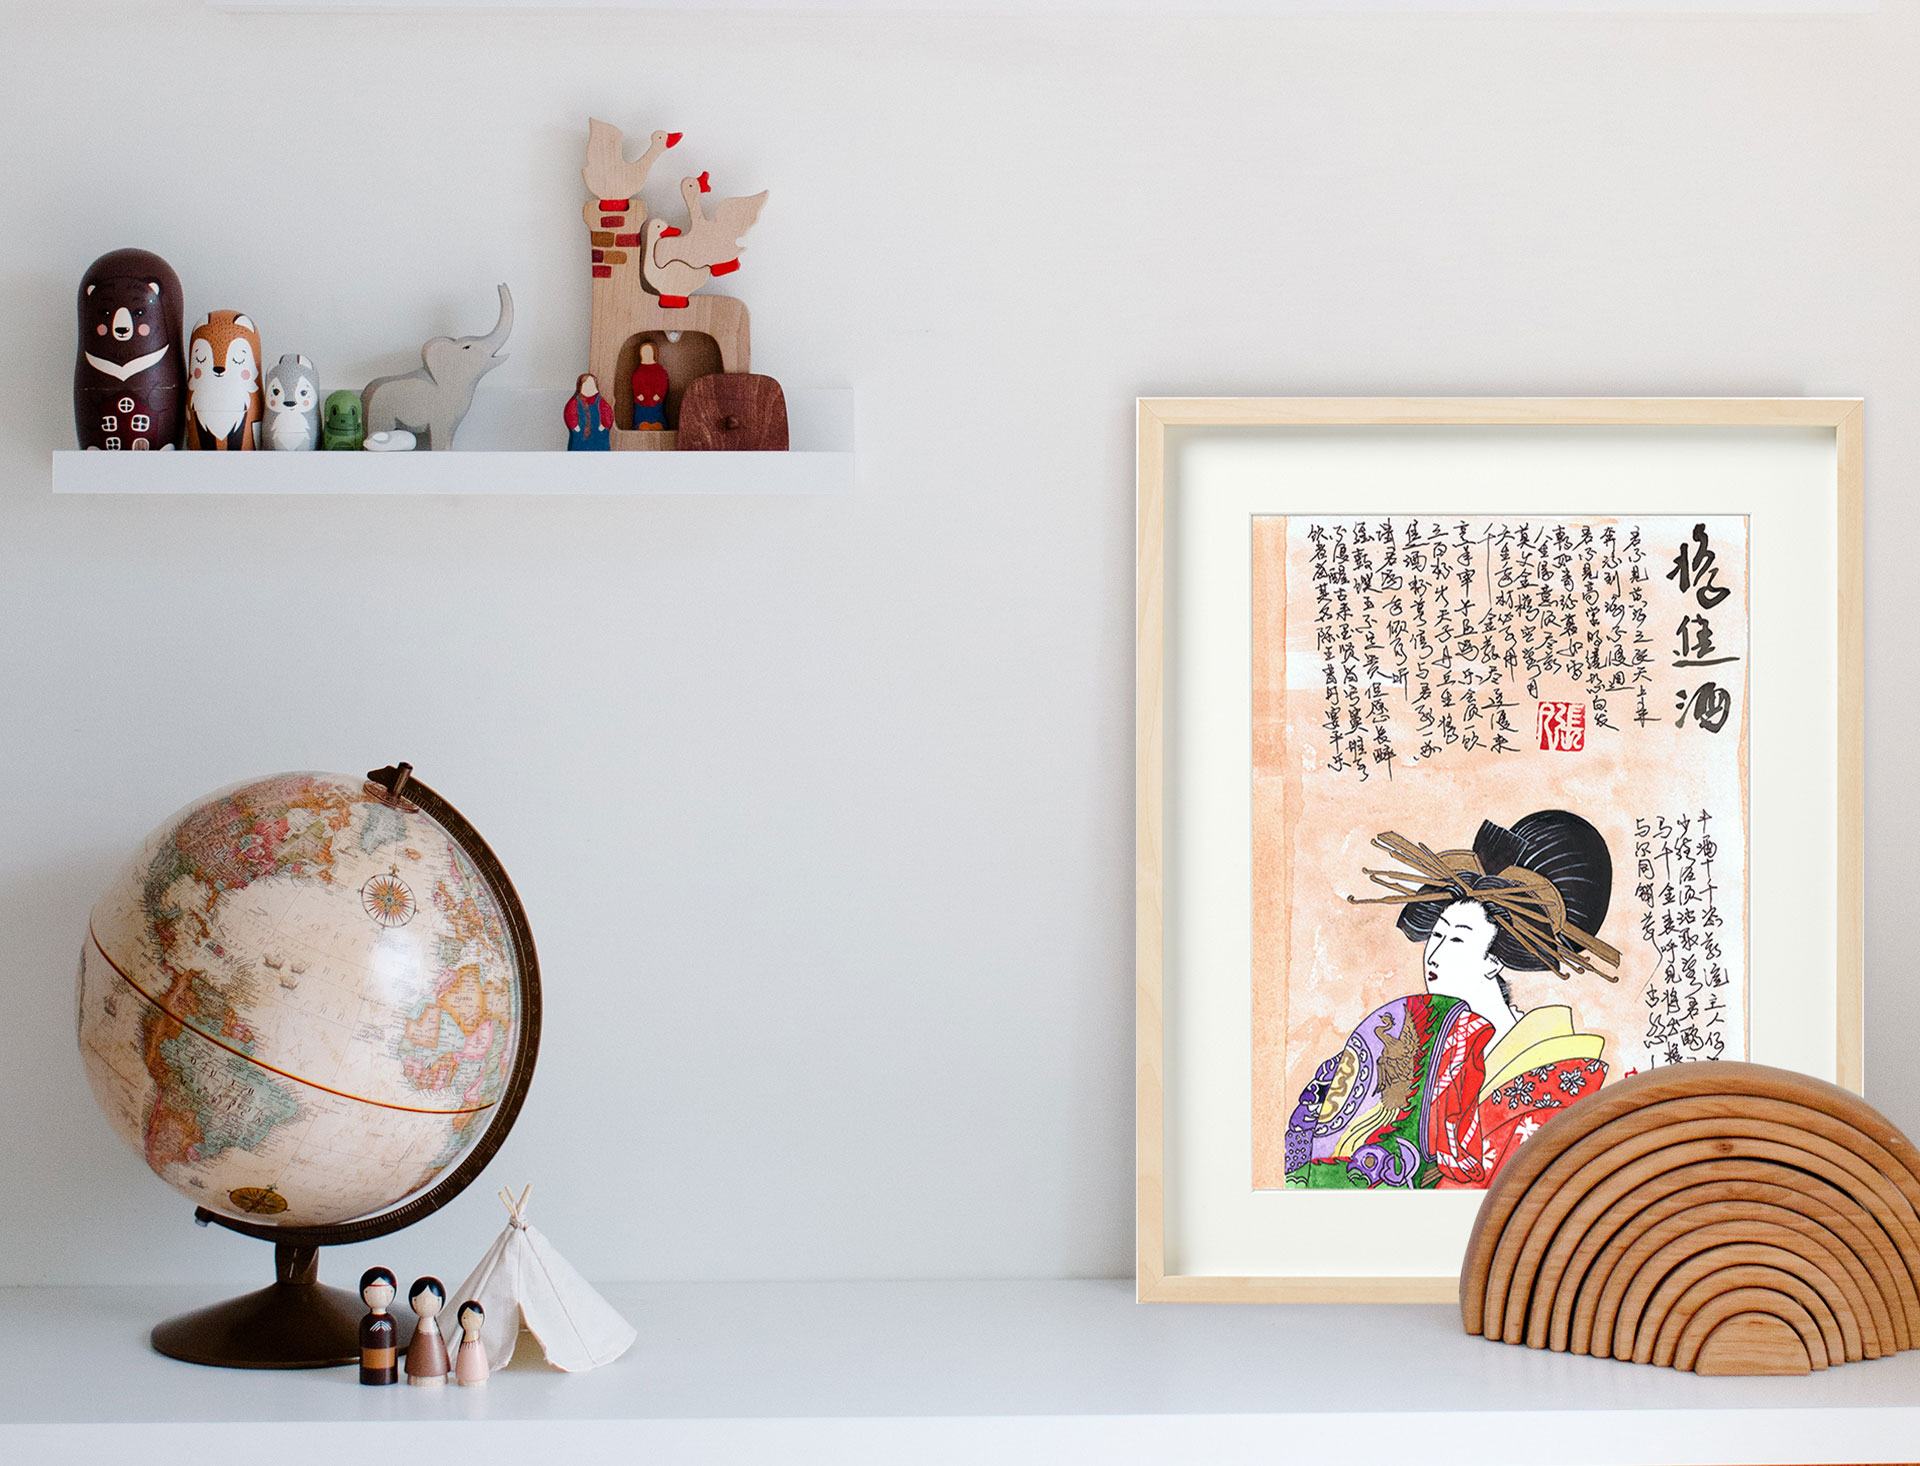 When Kitagawa Utamaro's Ukiyo-e Beauty Meets Libai's Poem Jiang Jin Jiu